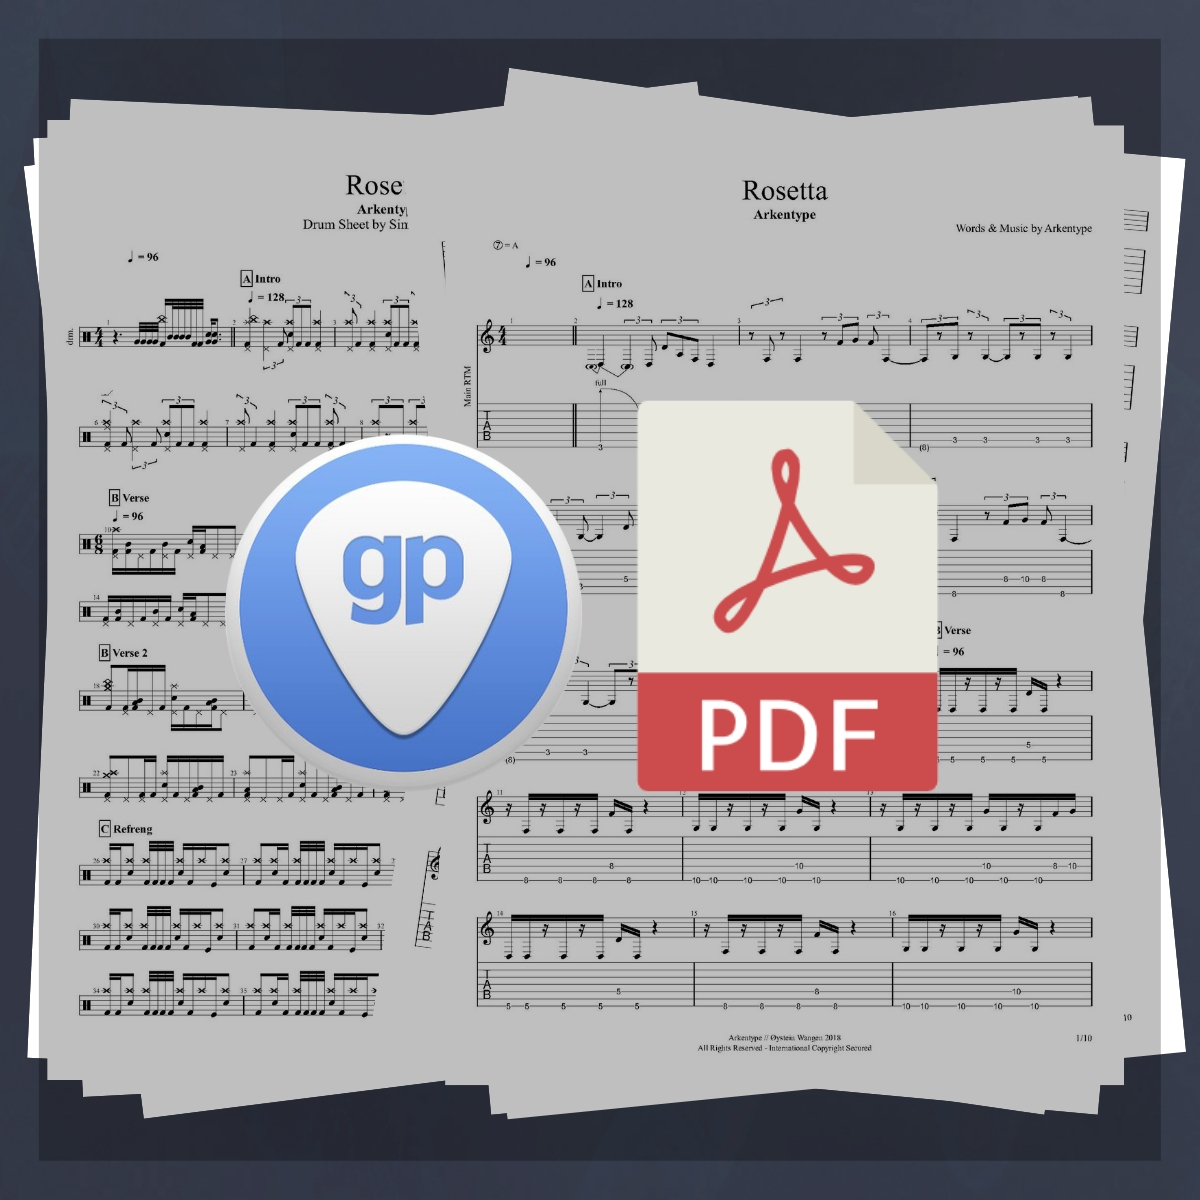 Arkentype Rosetta Guitar and Drums - Tabulature and Sheet Music